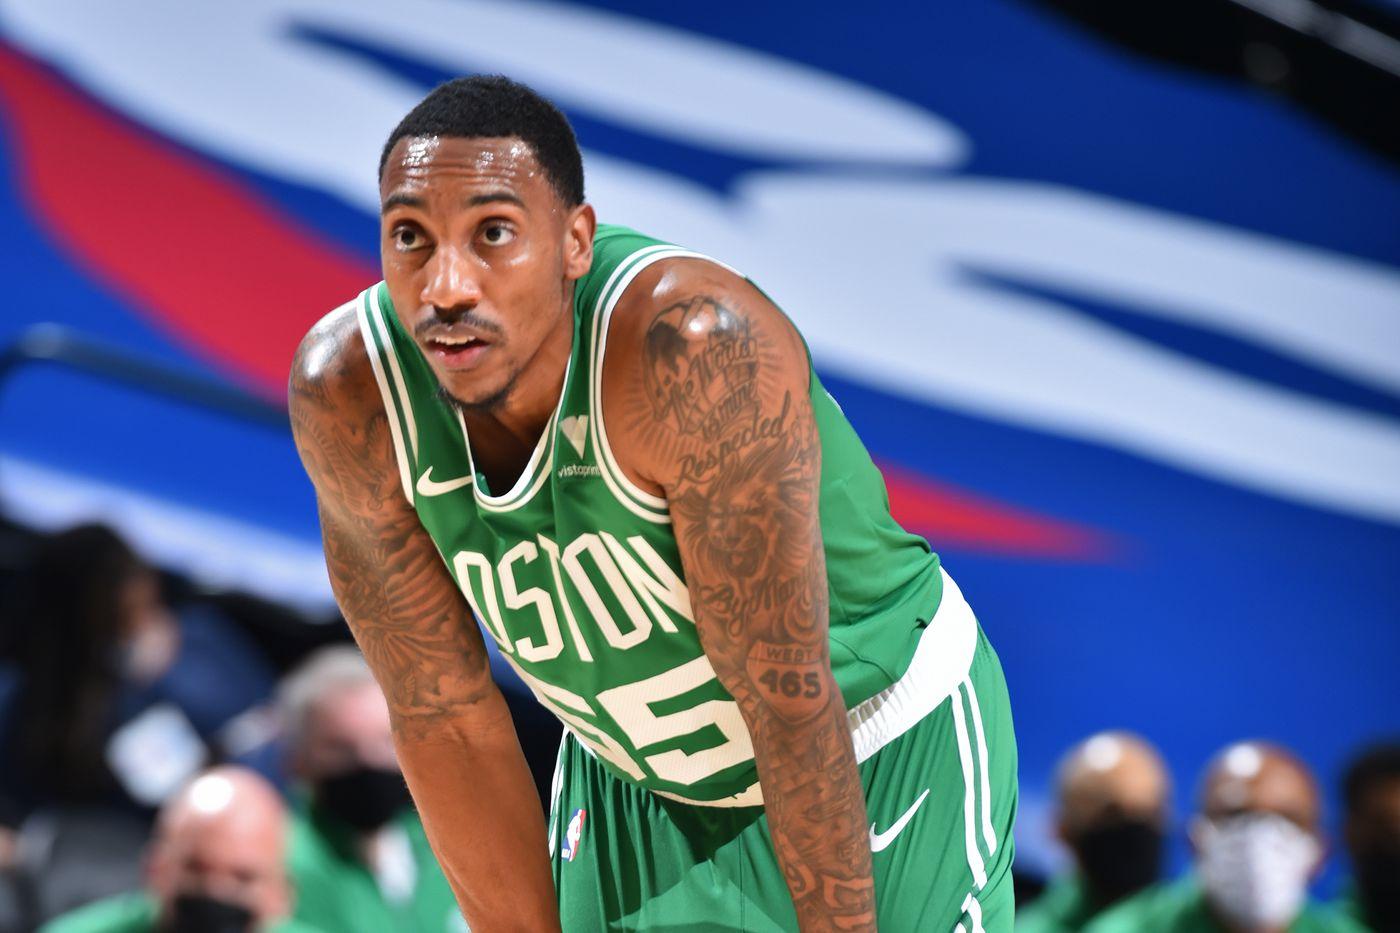 How did Jeff Teague look in his Boston Celtics debut? - CelticsBlog